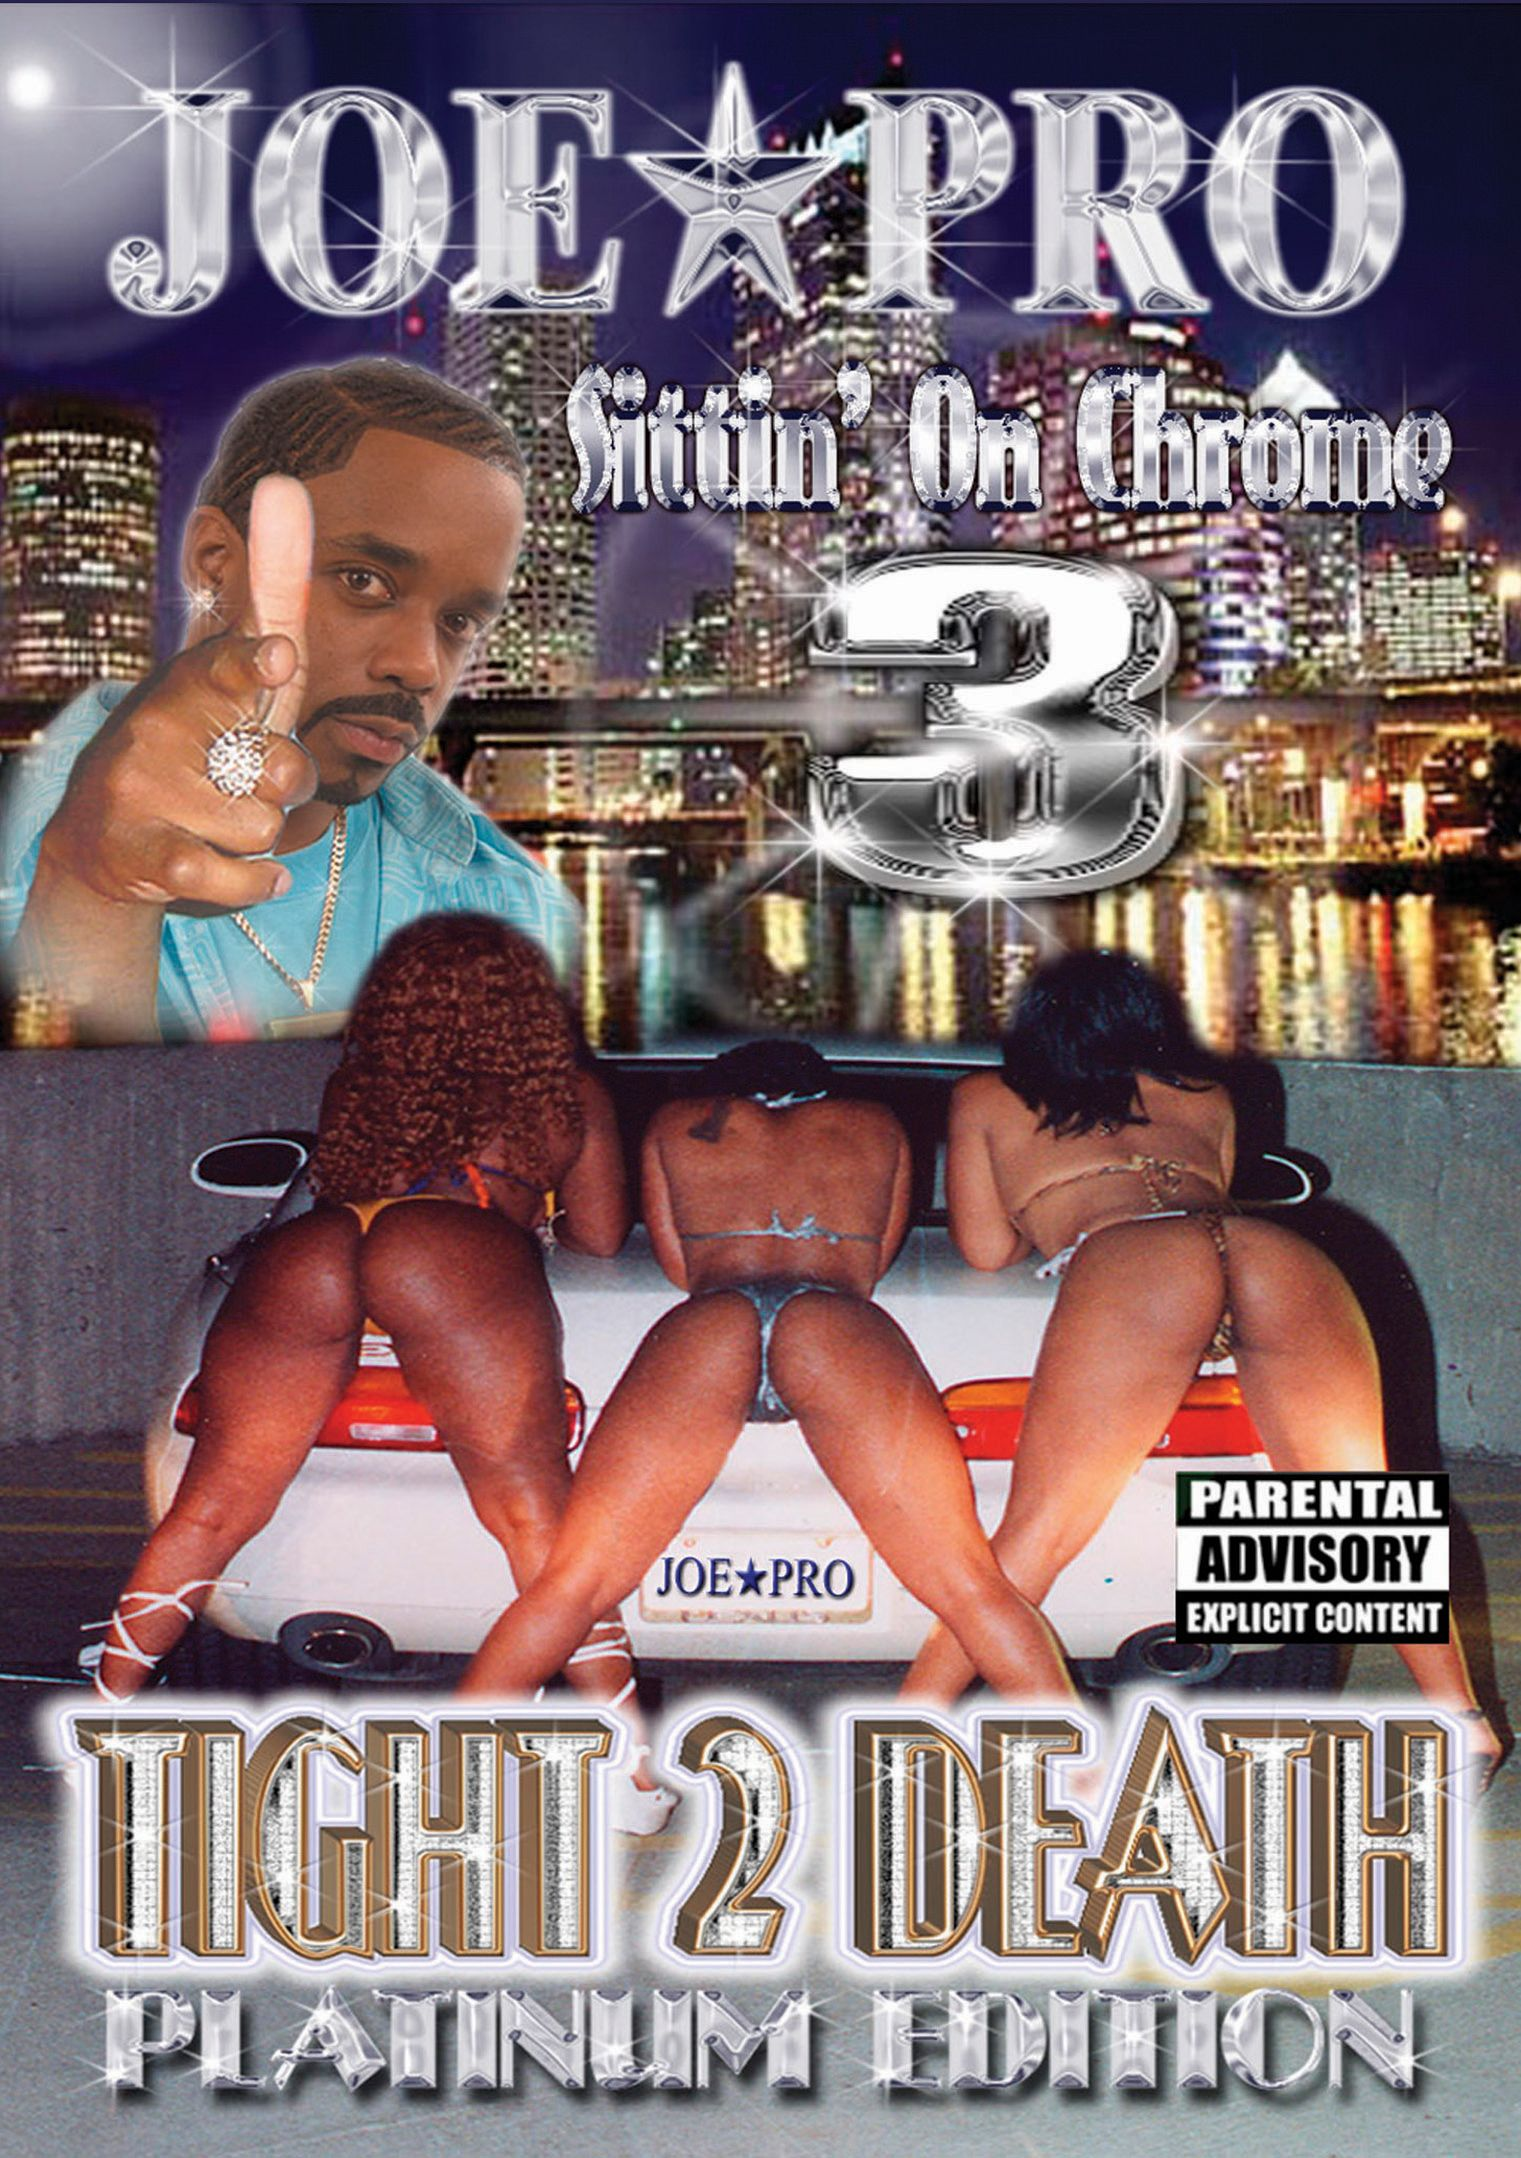 Joe Pro: Sittin On Chrome, Vol. 3 - Tight 2 Death